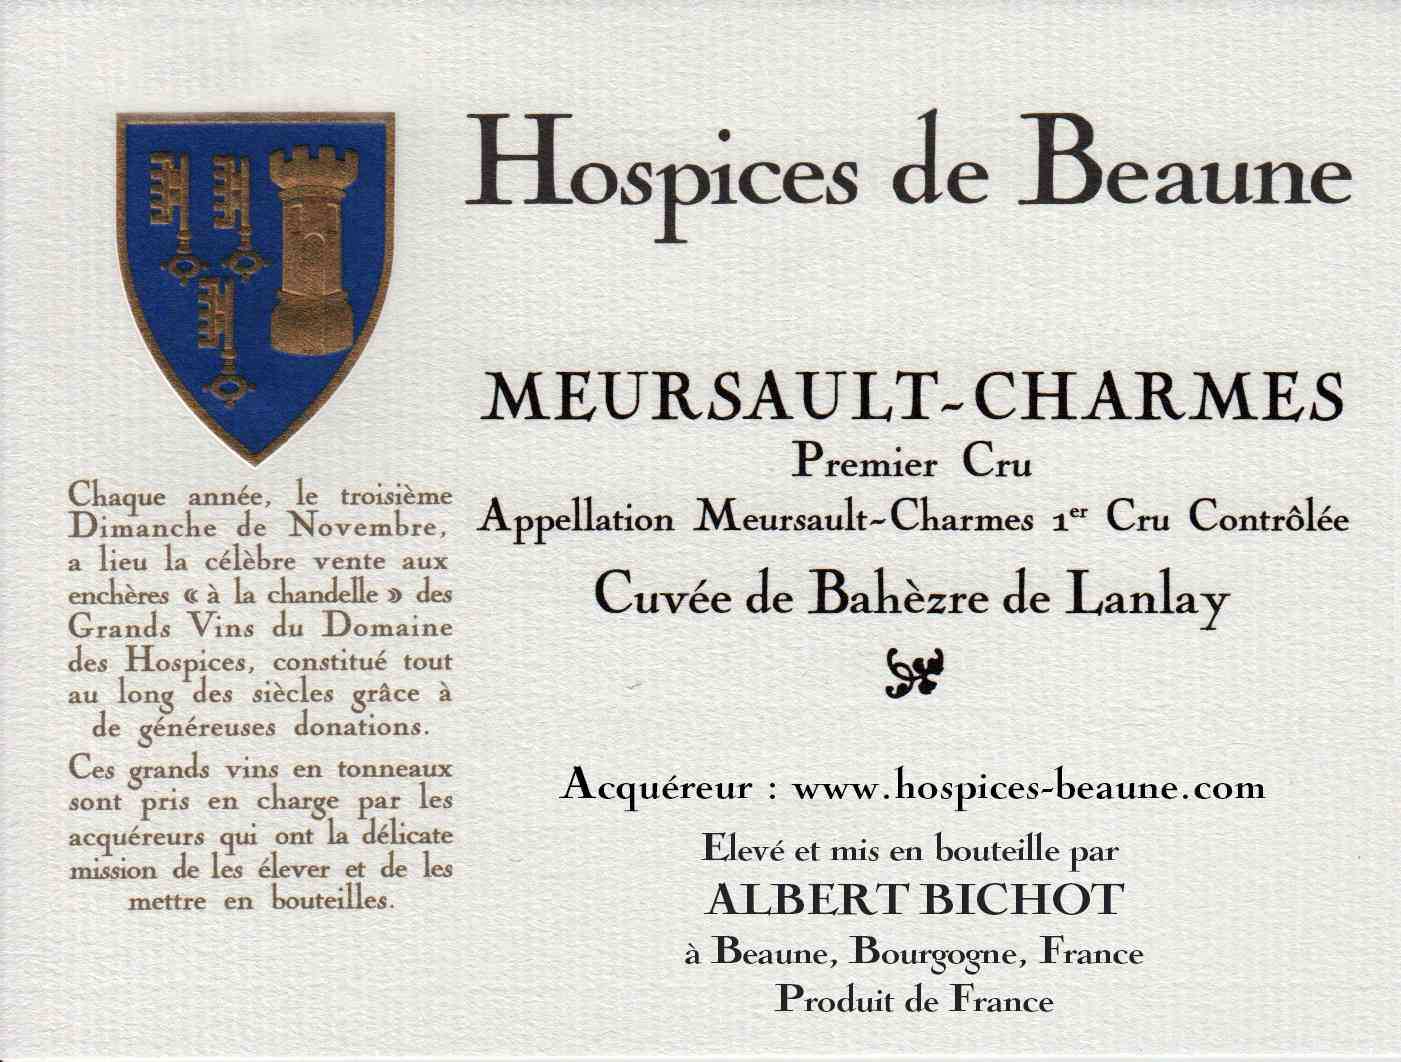 Encheres-auction-HospicesdeBeaune-AlbertBichot-Meursault-Charmes-PremierCru-Cuvee-BahèzredeLanlay